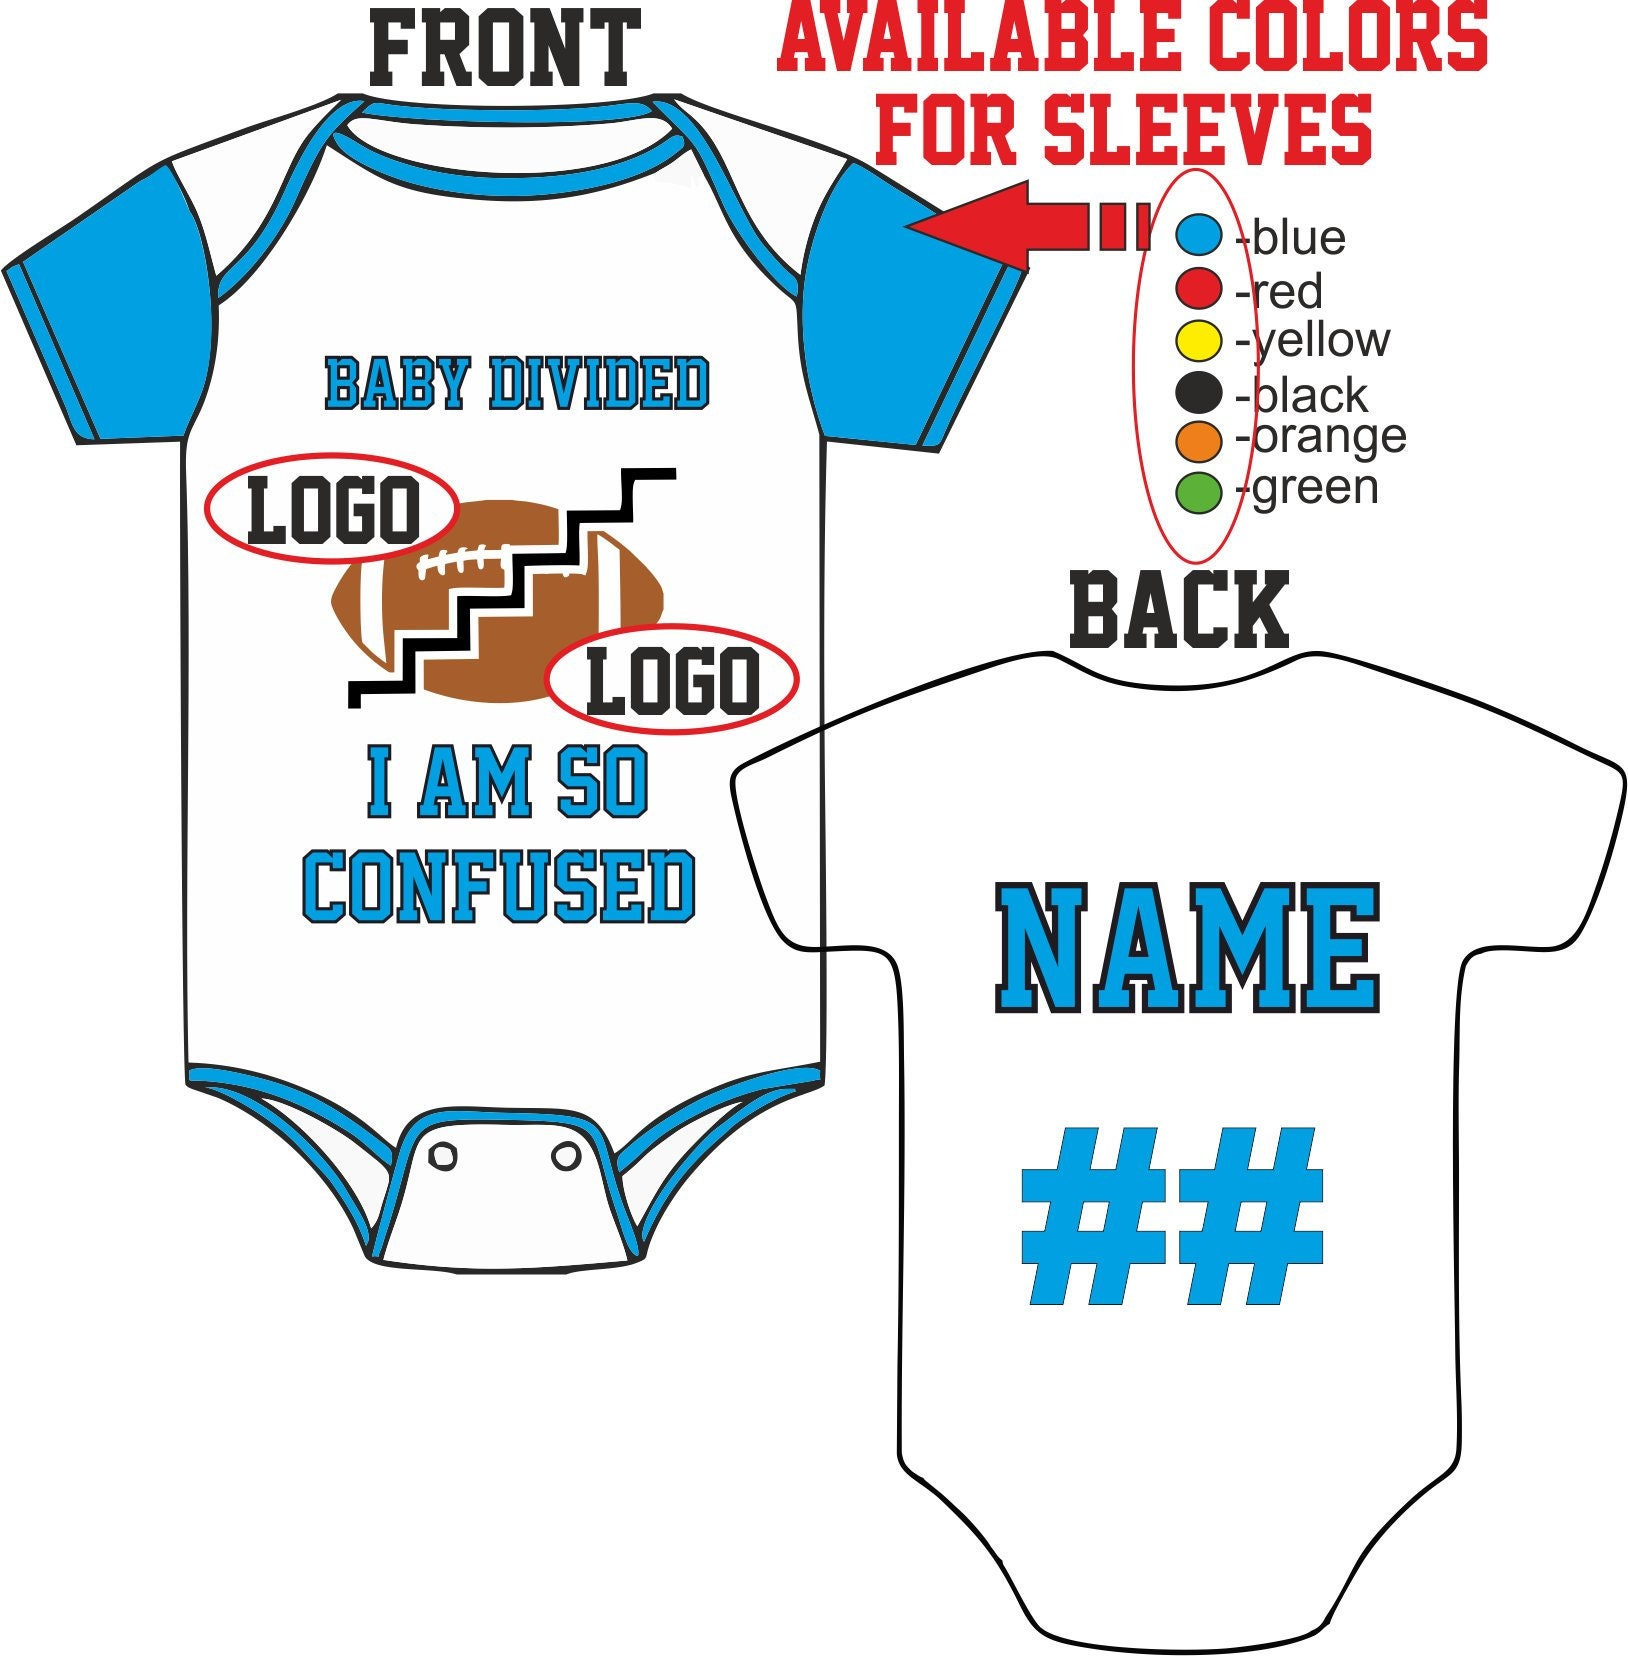 newest de296 08330 Customize Your Own Football Shirts | Azərbaycan Dillər ...